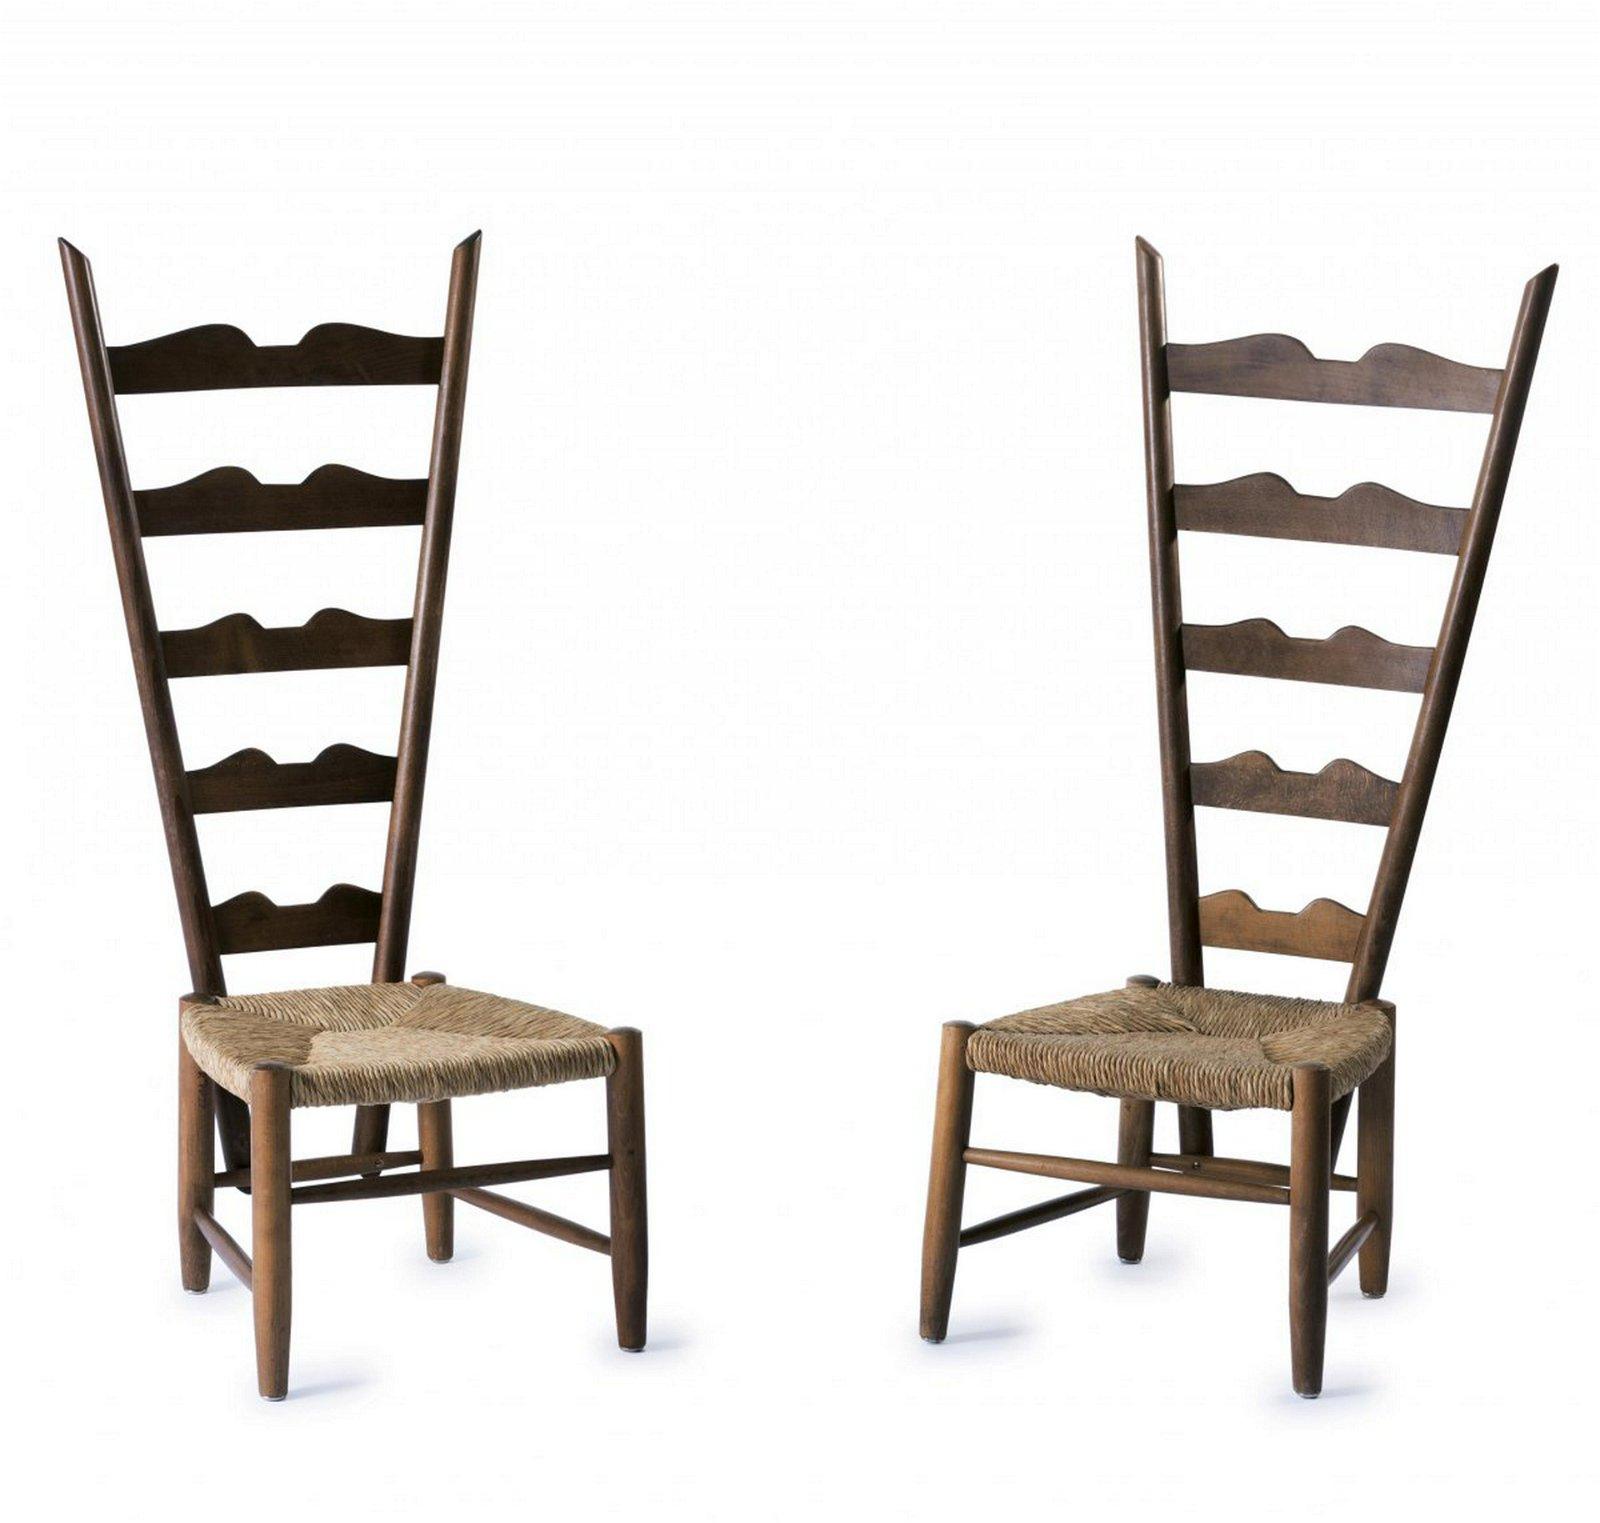 Gio Ponti, Two highback chairs, c. 1939